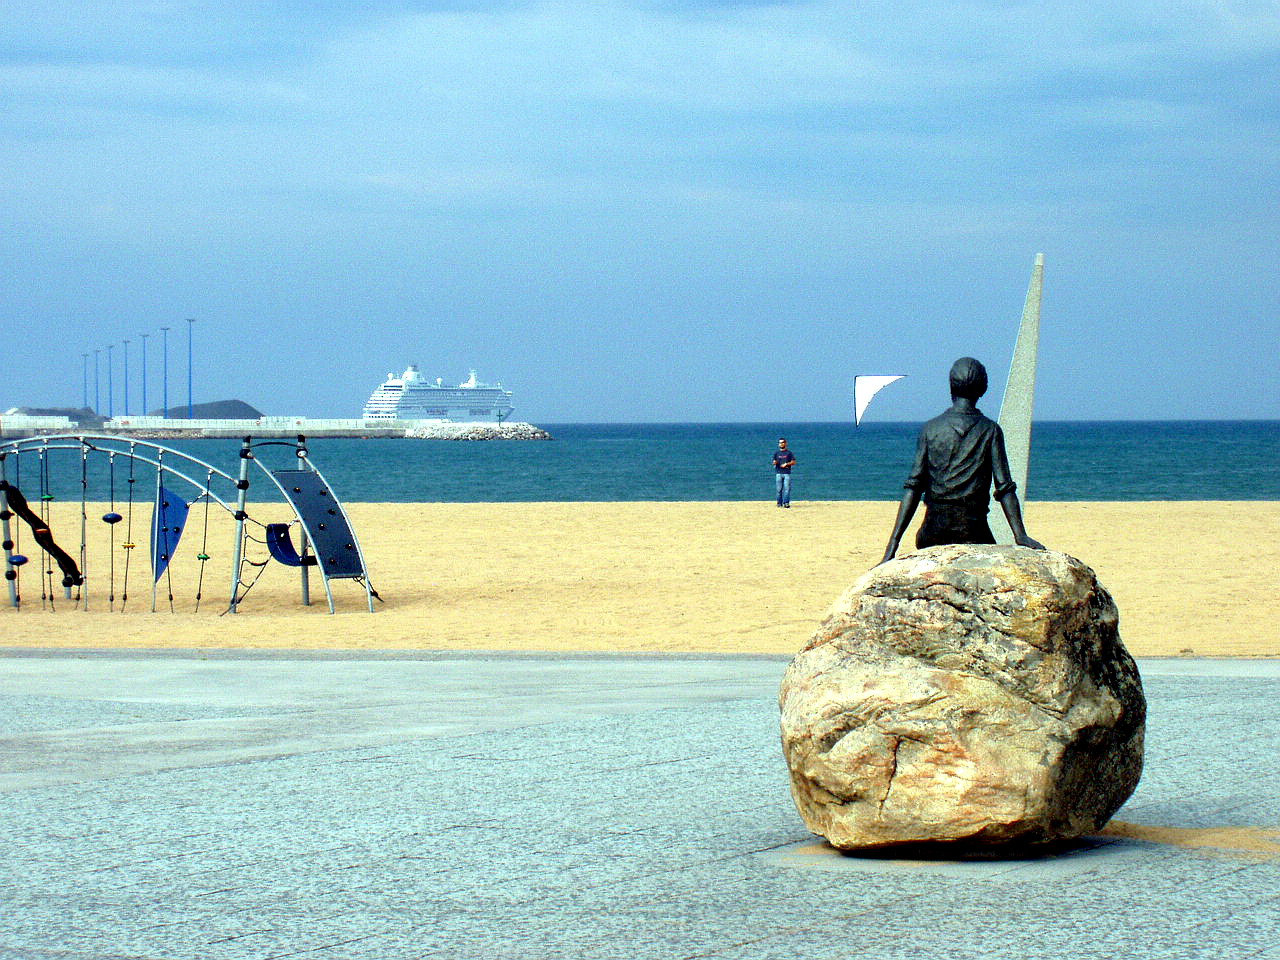 Foto playa Arbeyal. Playa del Arbeyal, La Calzada, Gijón, Asturias